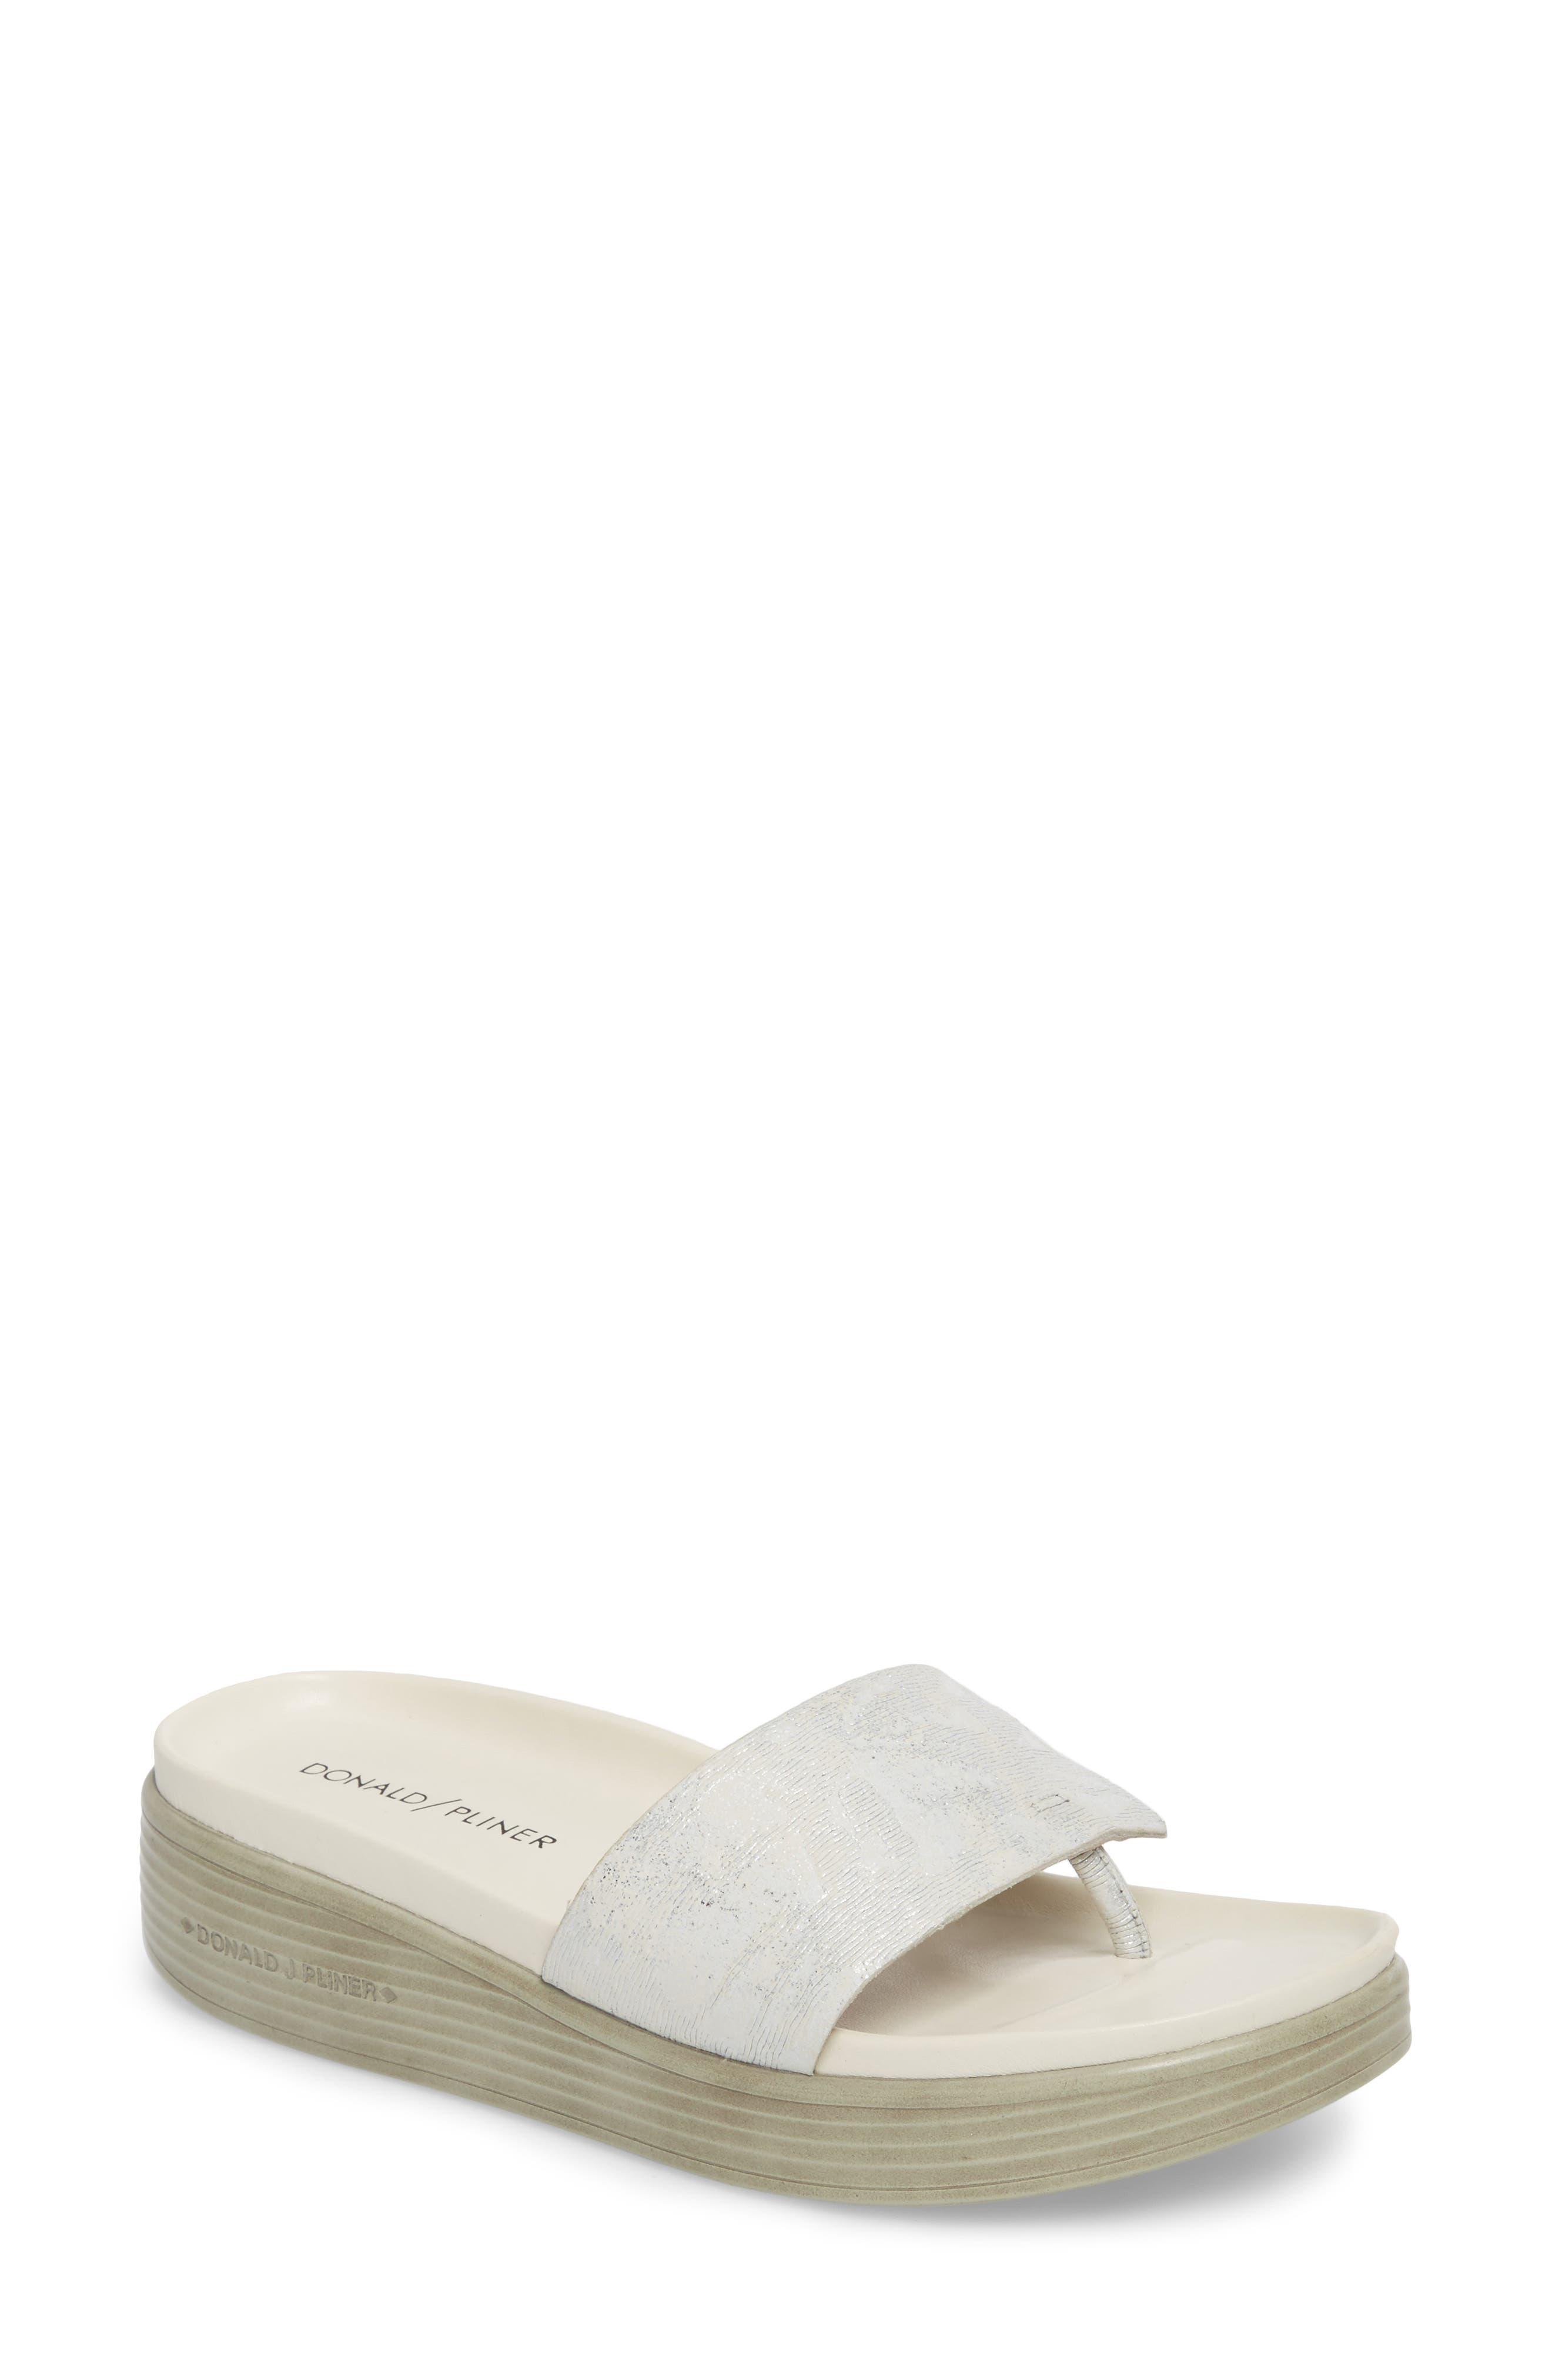 Fifi Slide Sandal,                             Main thumbnail 1, color,                             Silver Leather